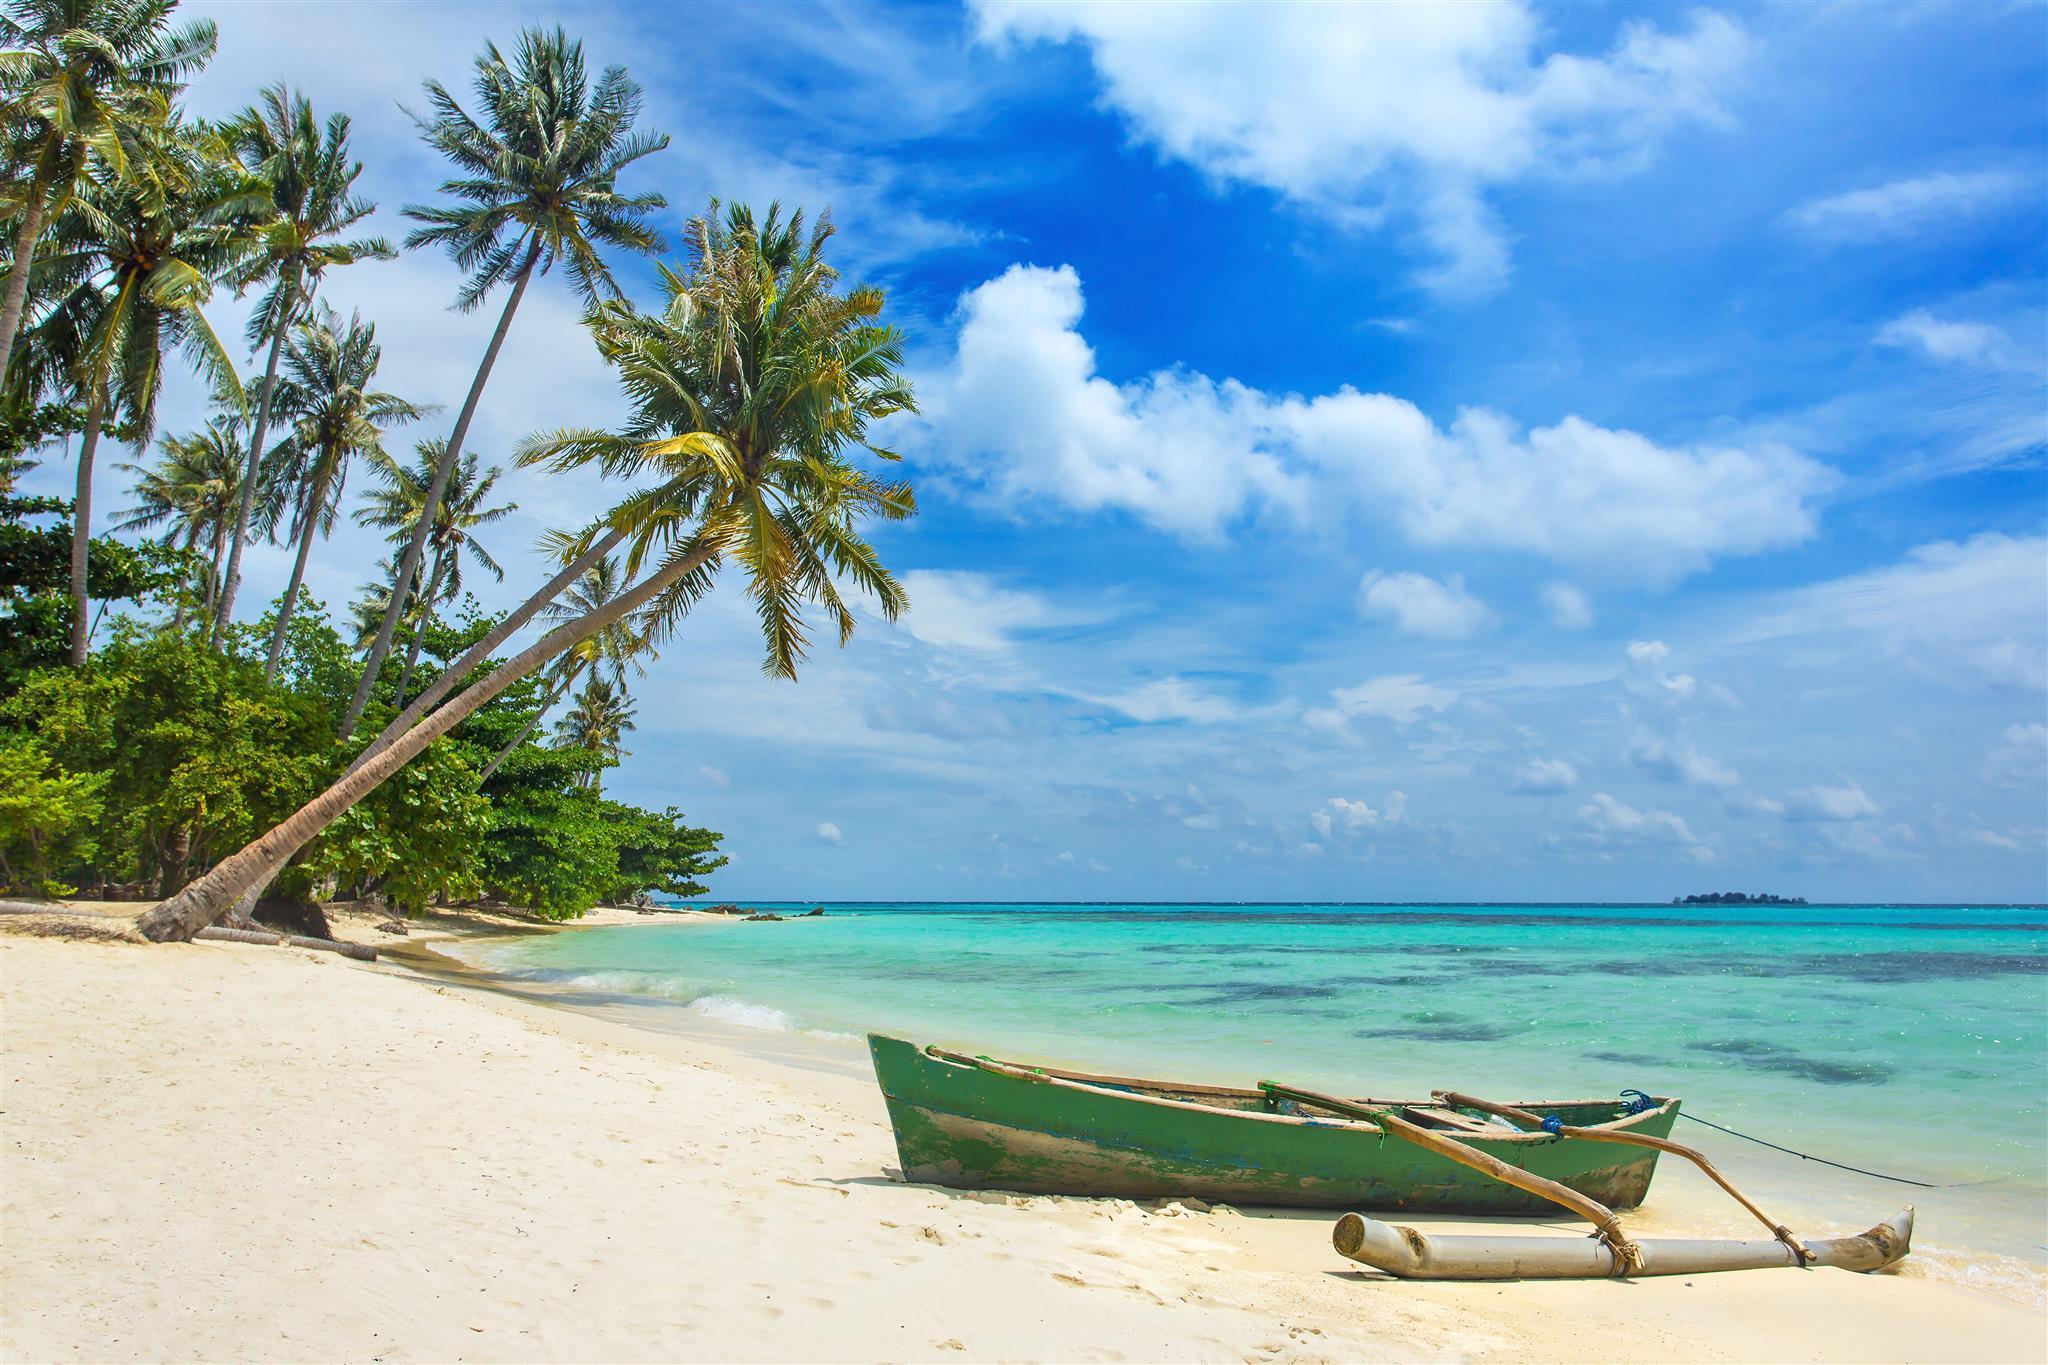 Seaside Beach Resto & Lounge, Jepara